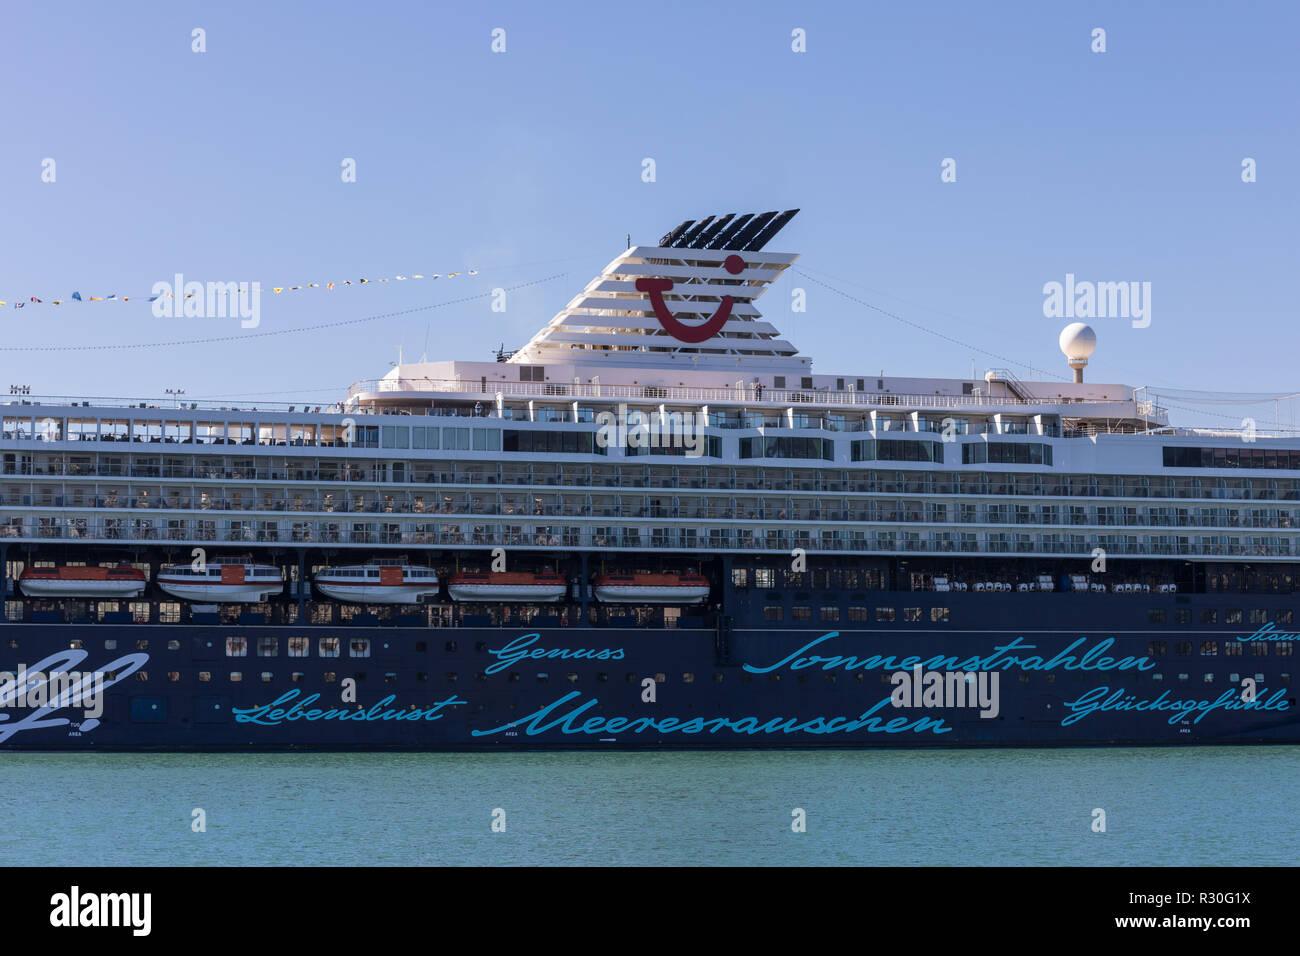 Luxury cruise ship Mein Schiff 2 detail - Stock Image